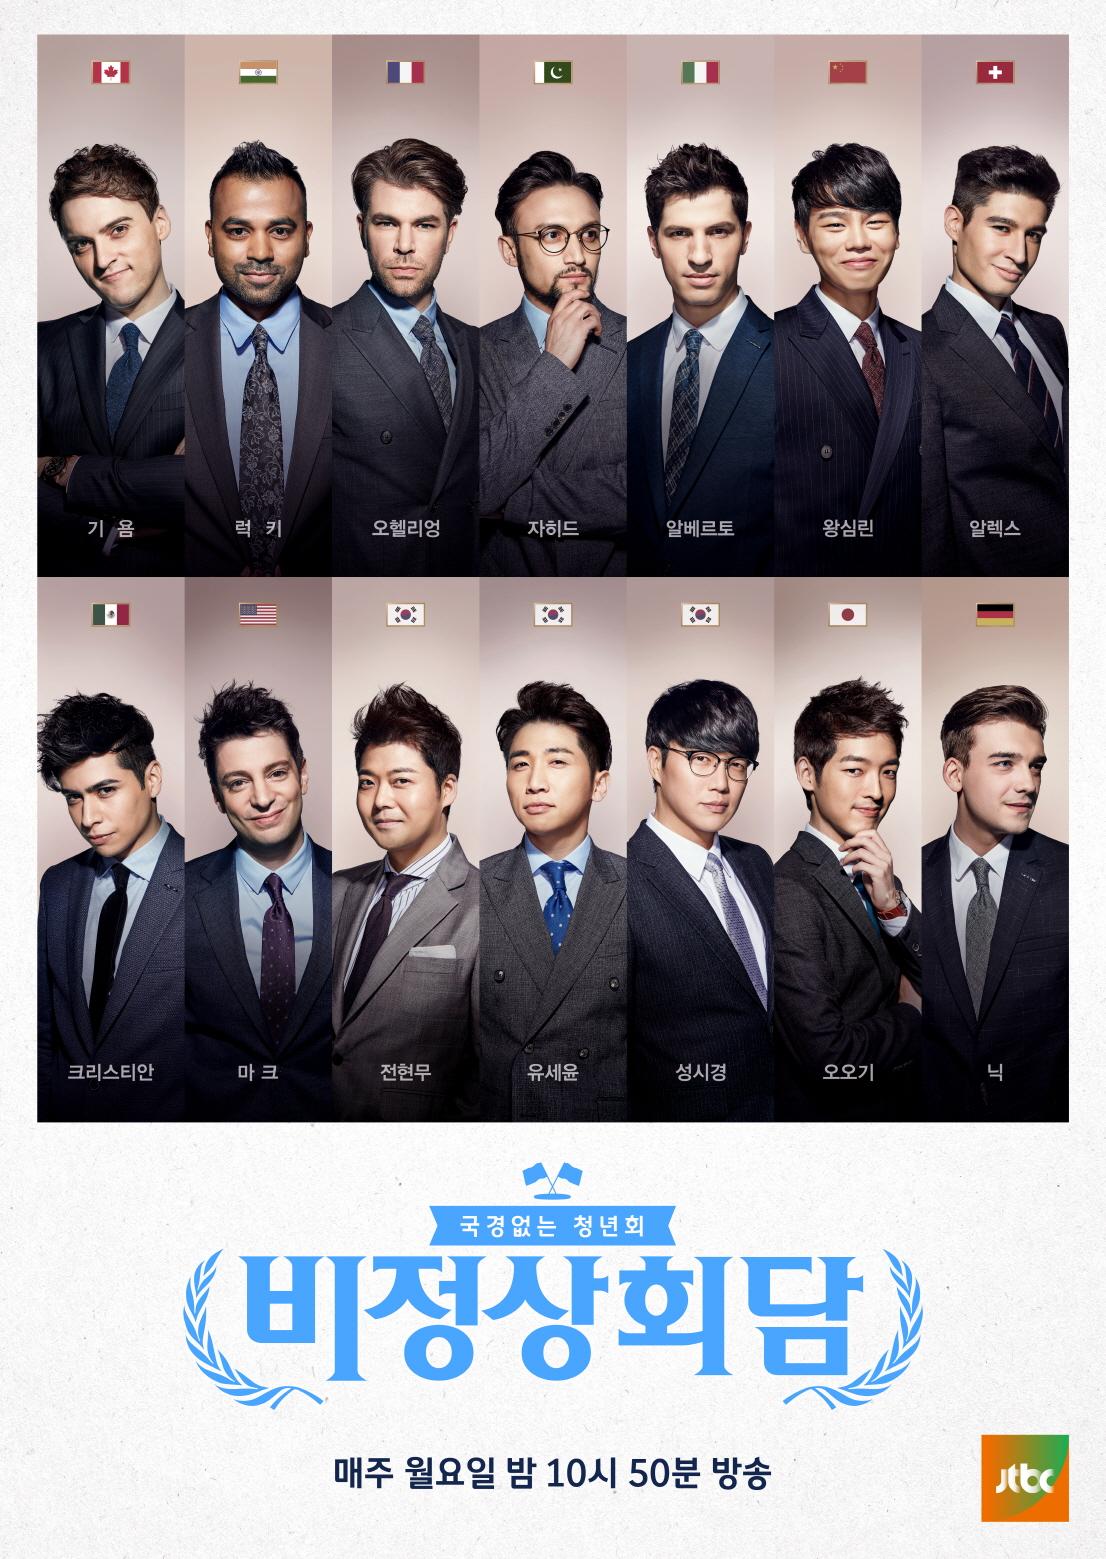 Study Korean with 'Abnormal Summit' | Korea Blog